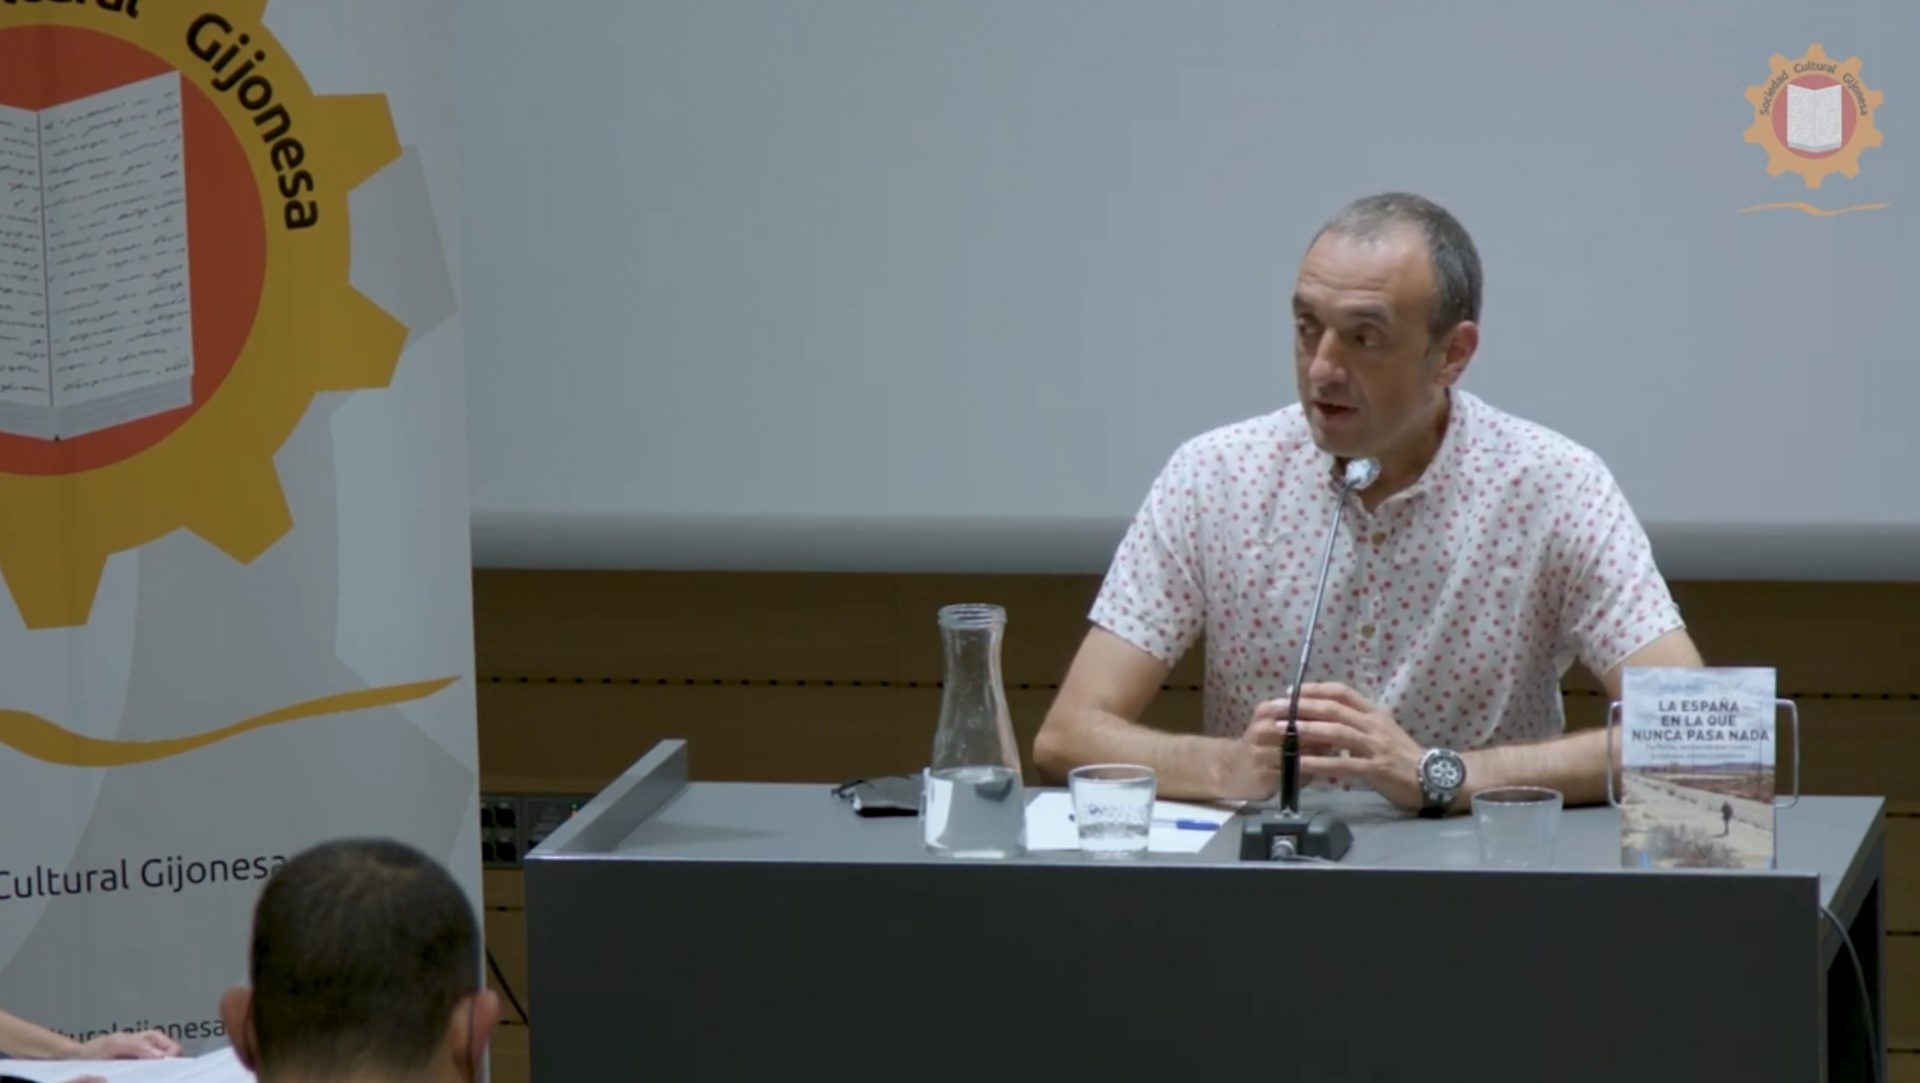 Presentación de Sergio Andrés Cabello